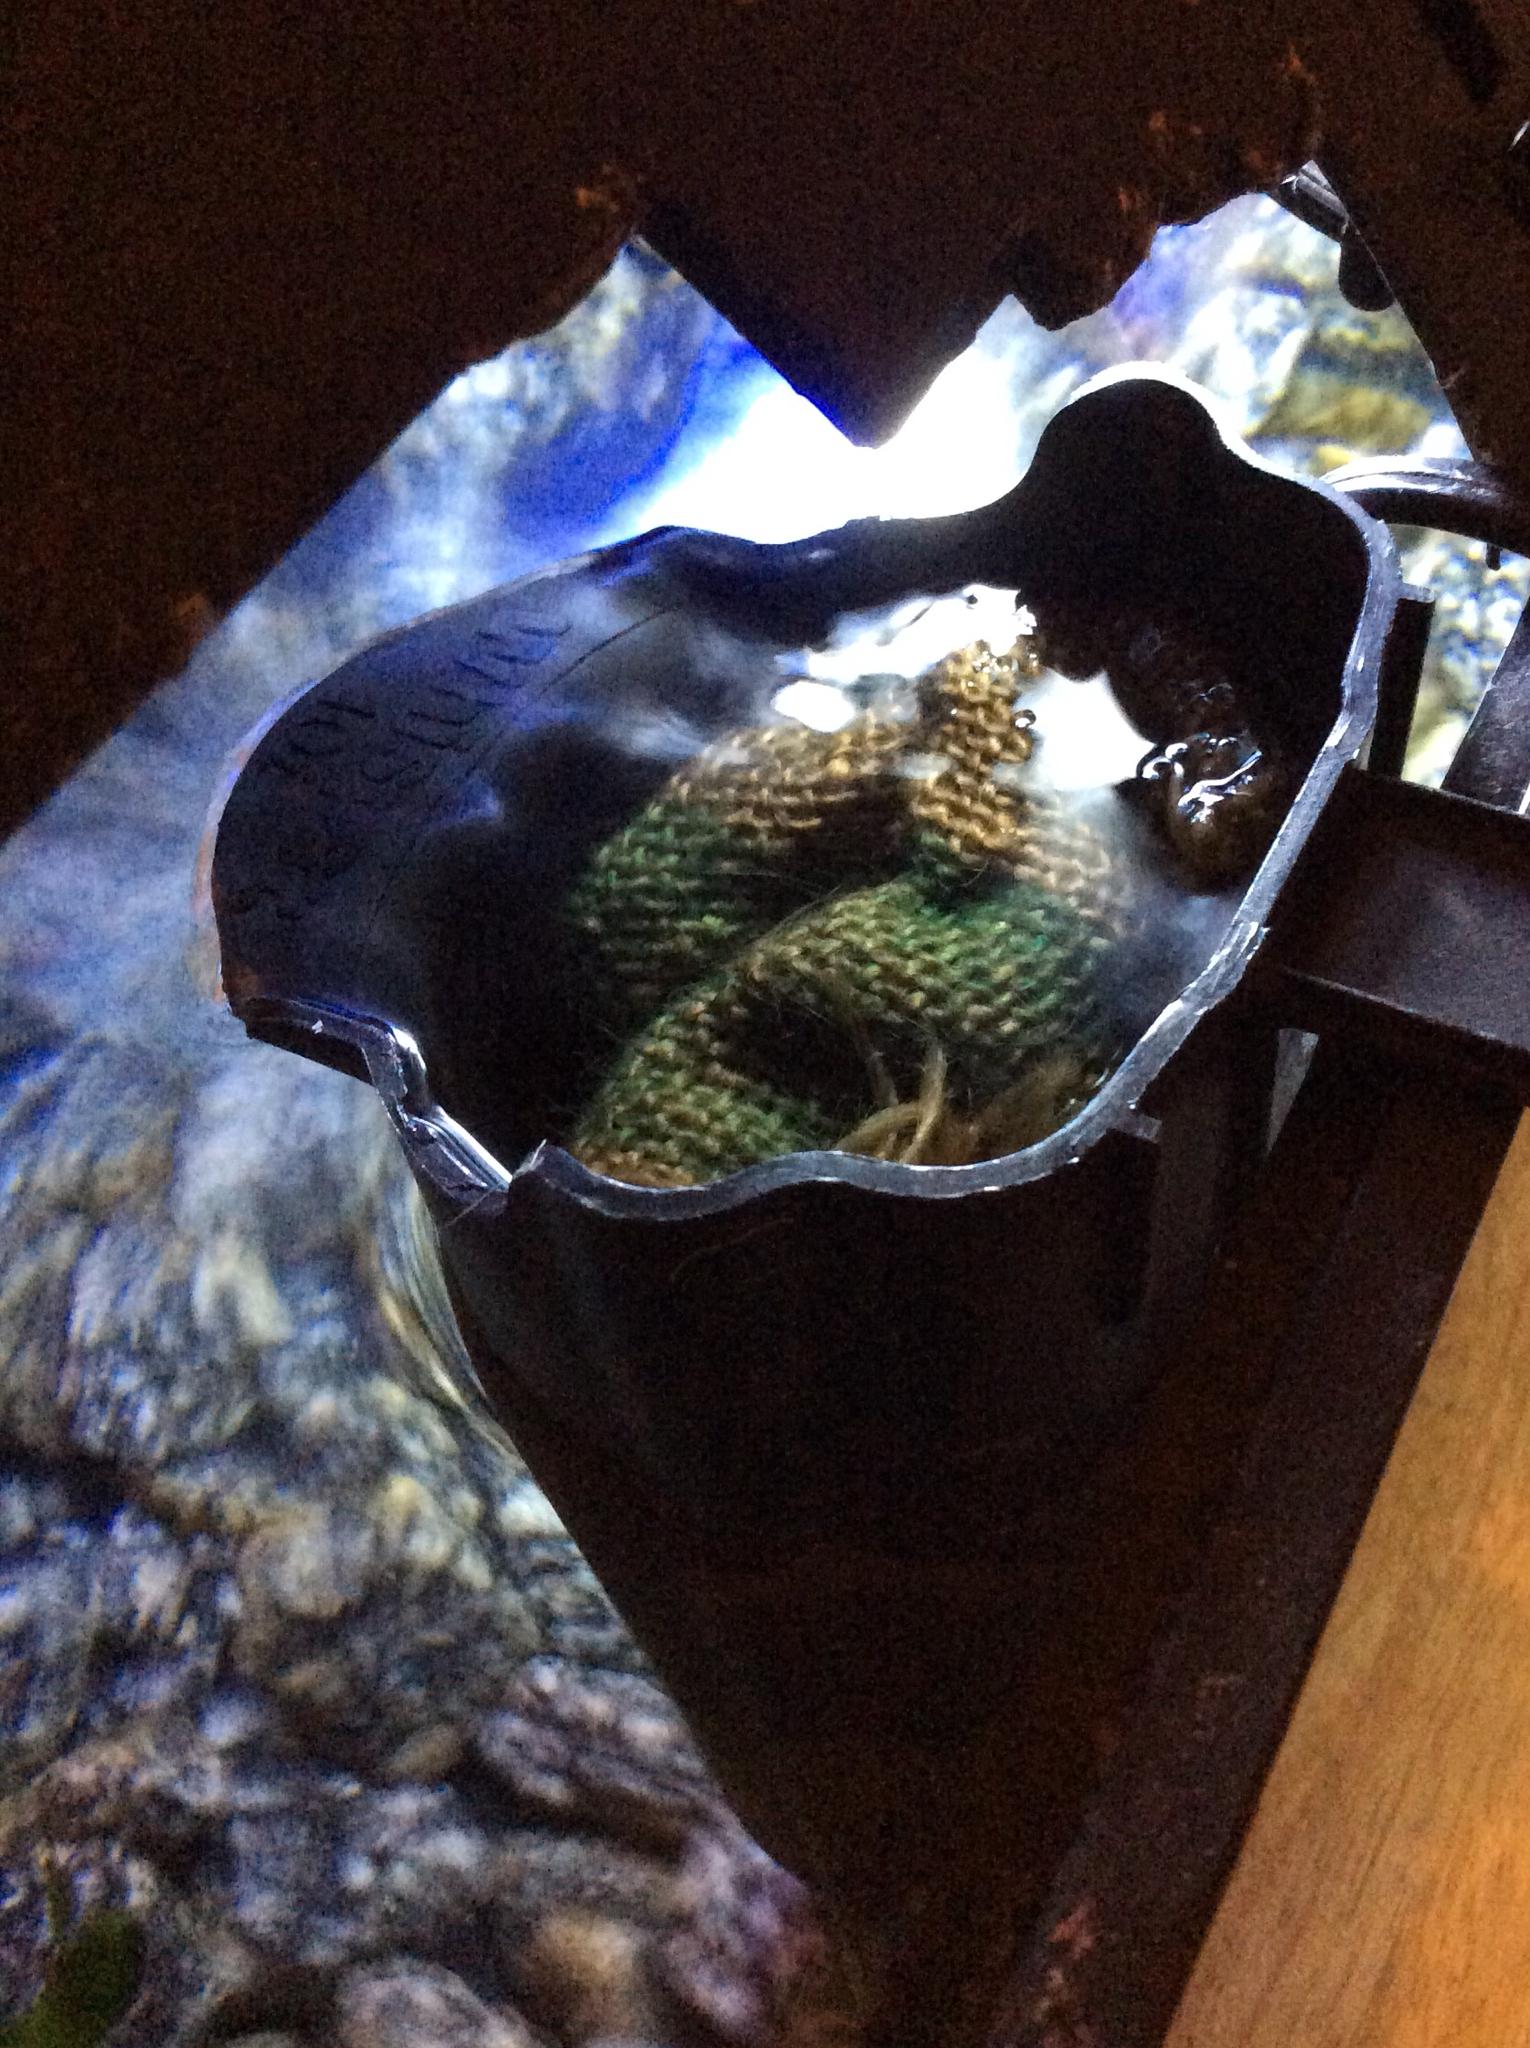 Aquarium fish tank making - Forum And Usage Of Internal External Aquarium Filters With